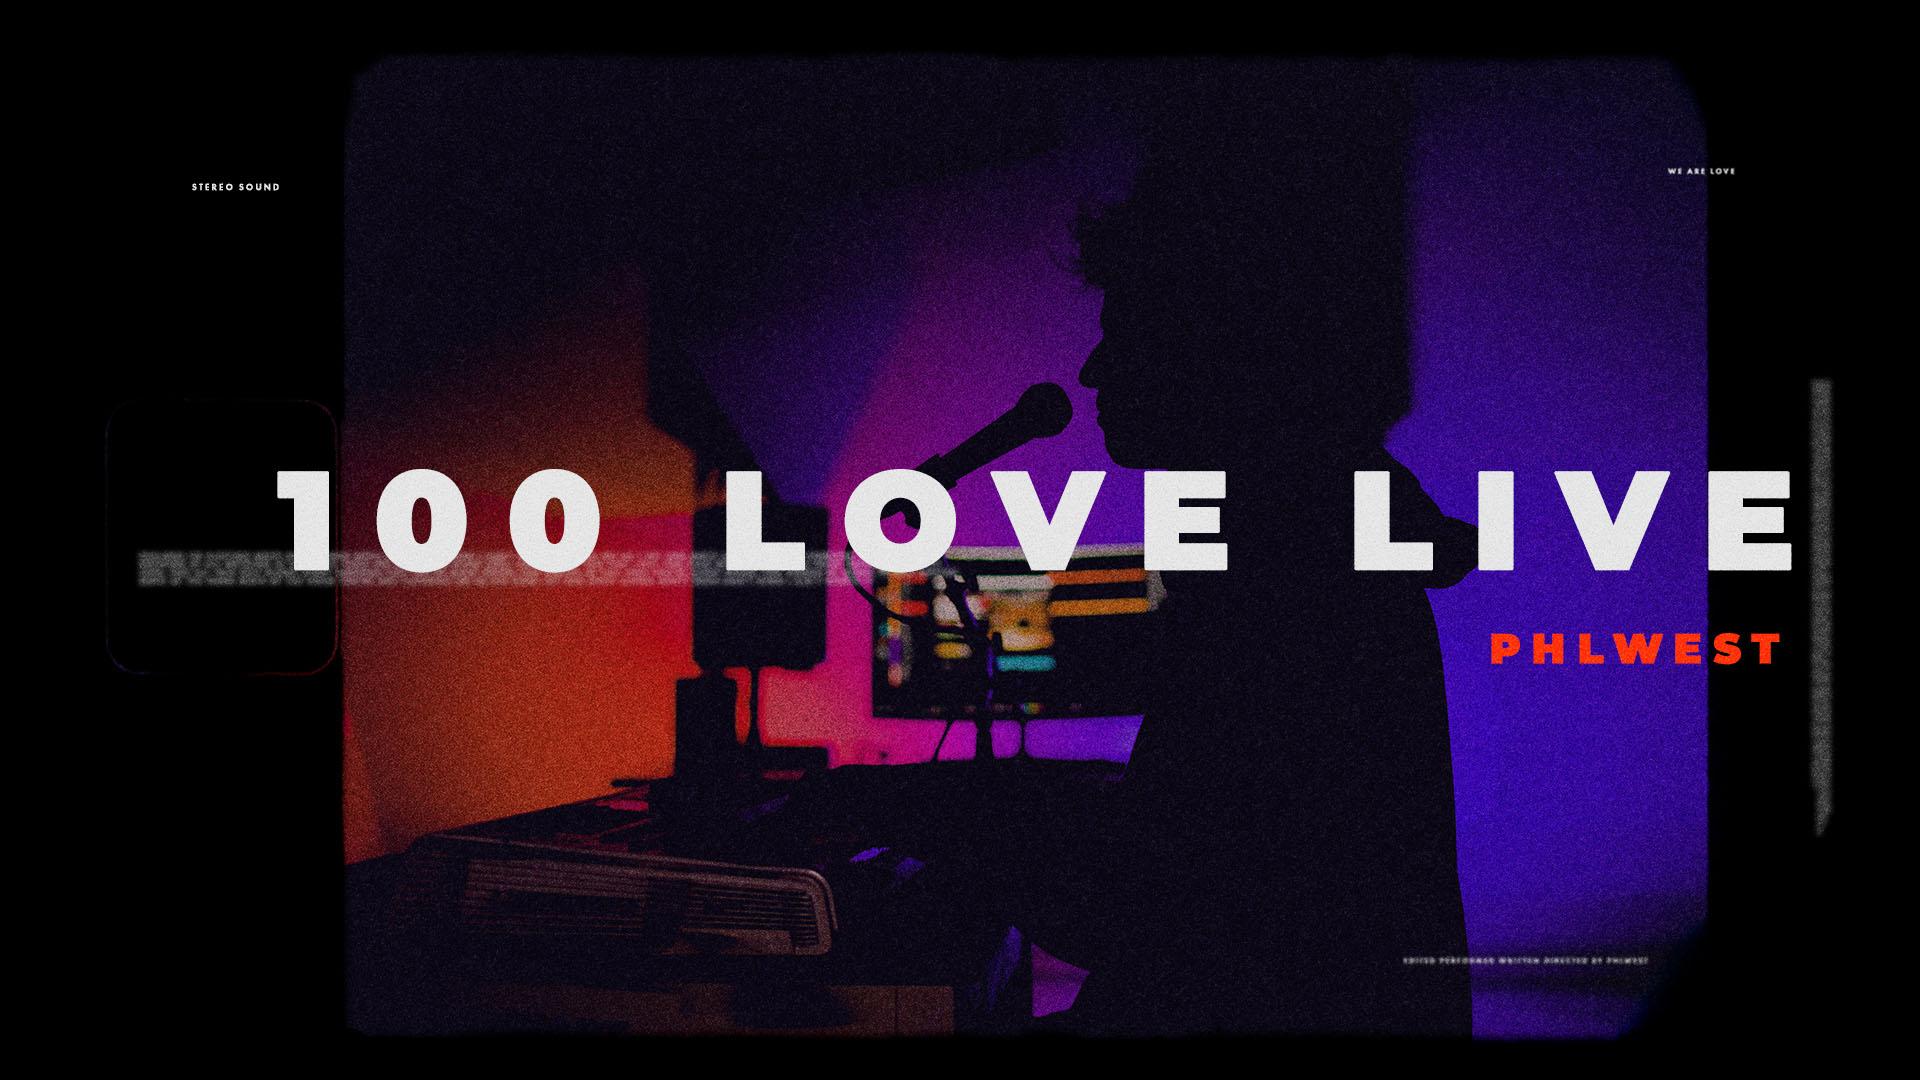 100 love live